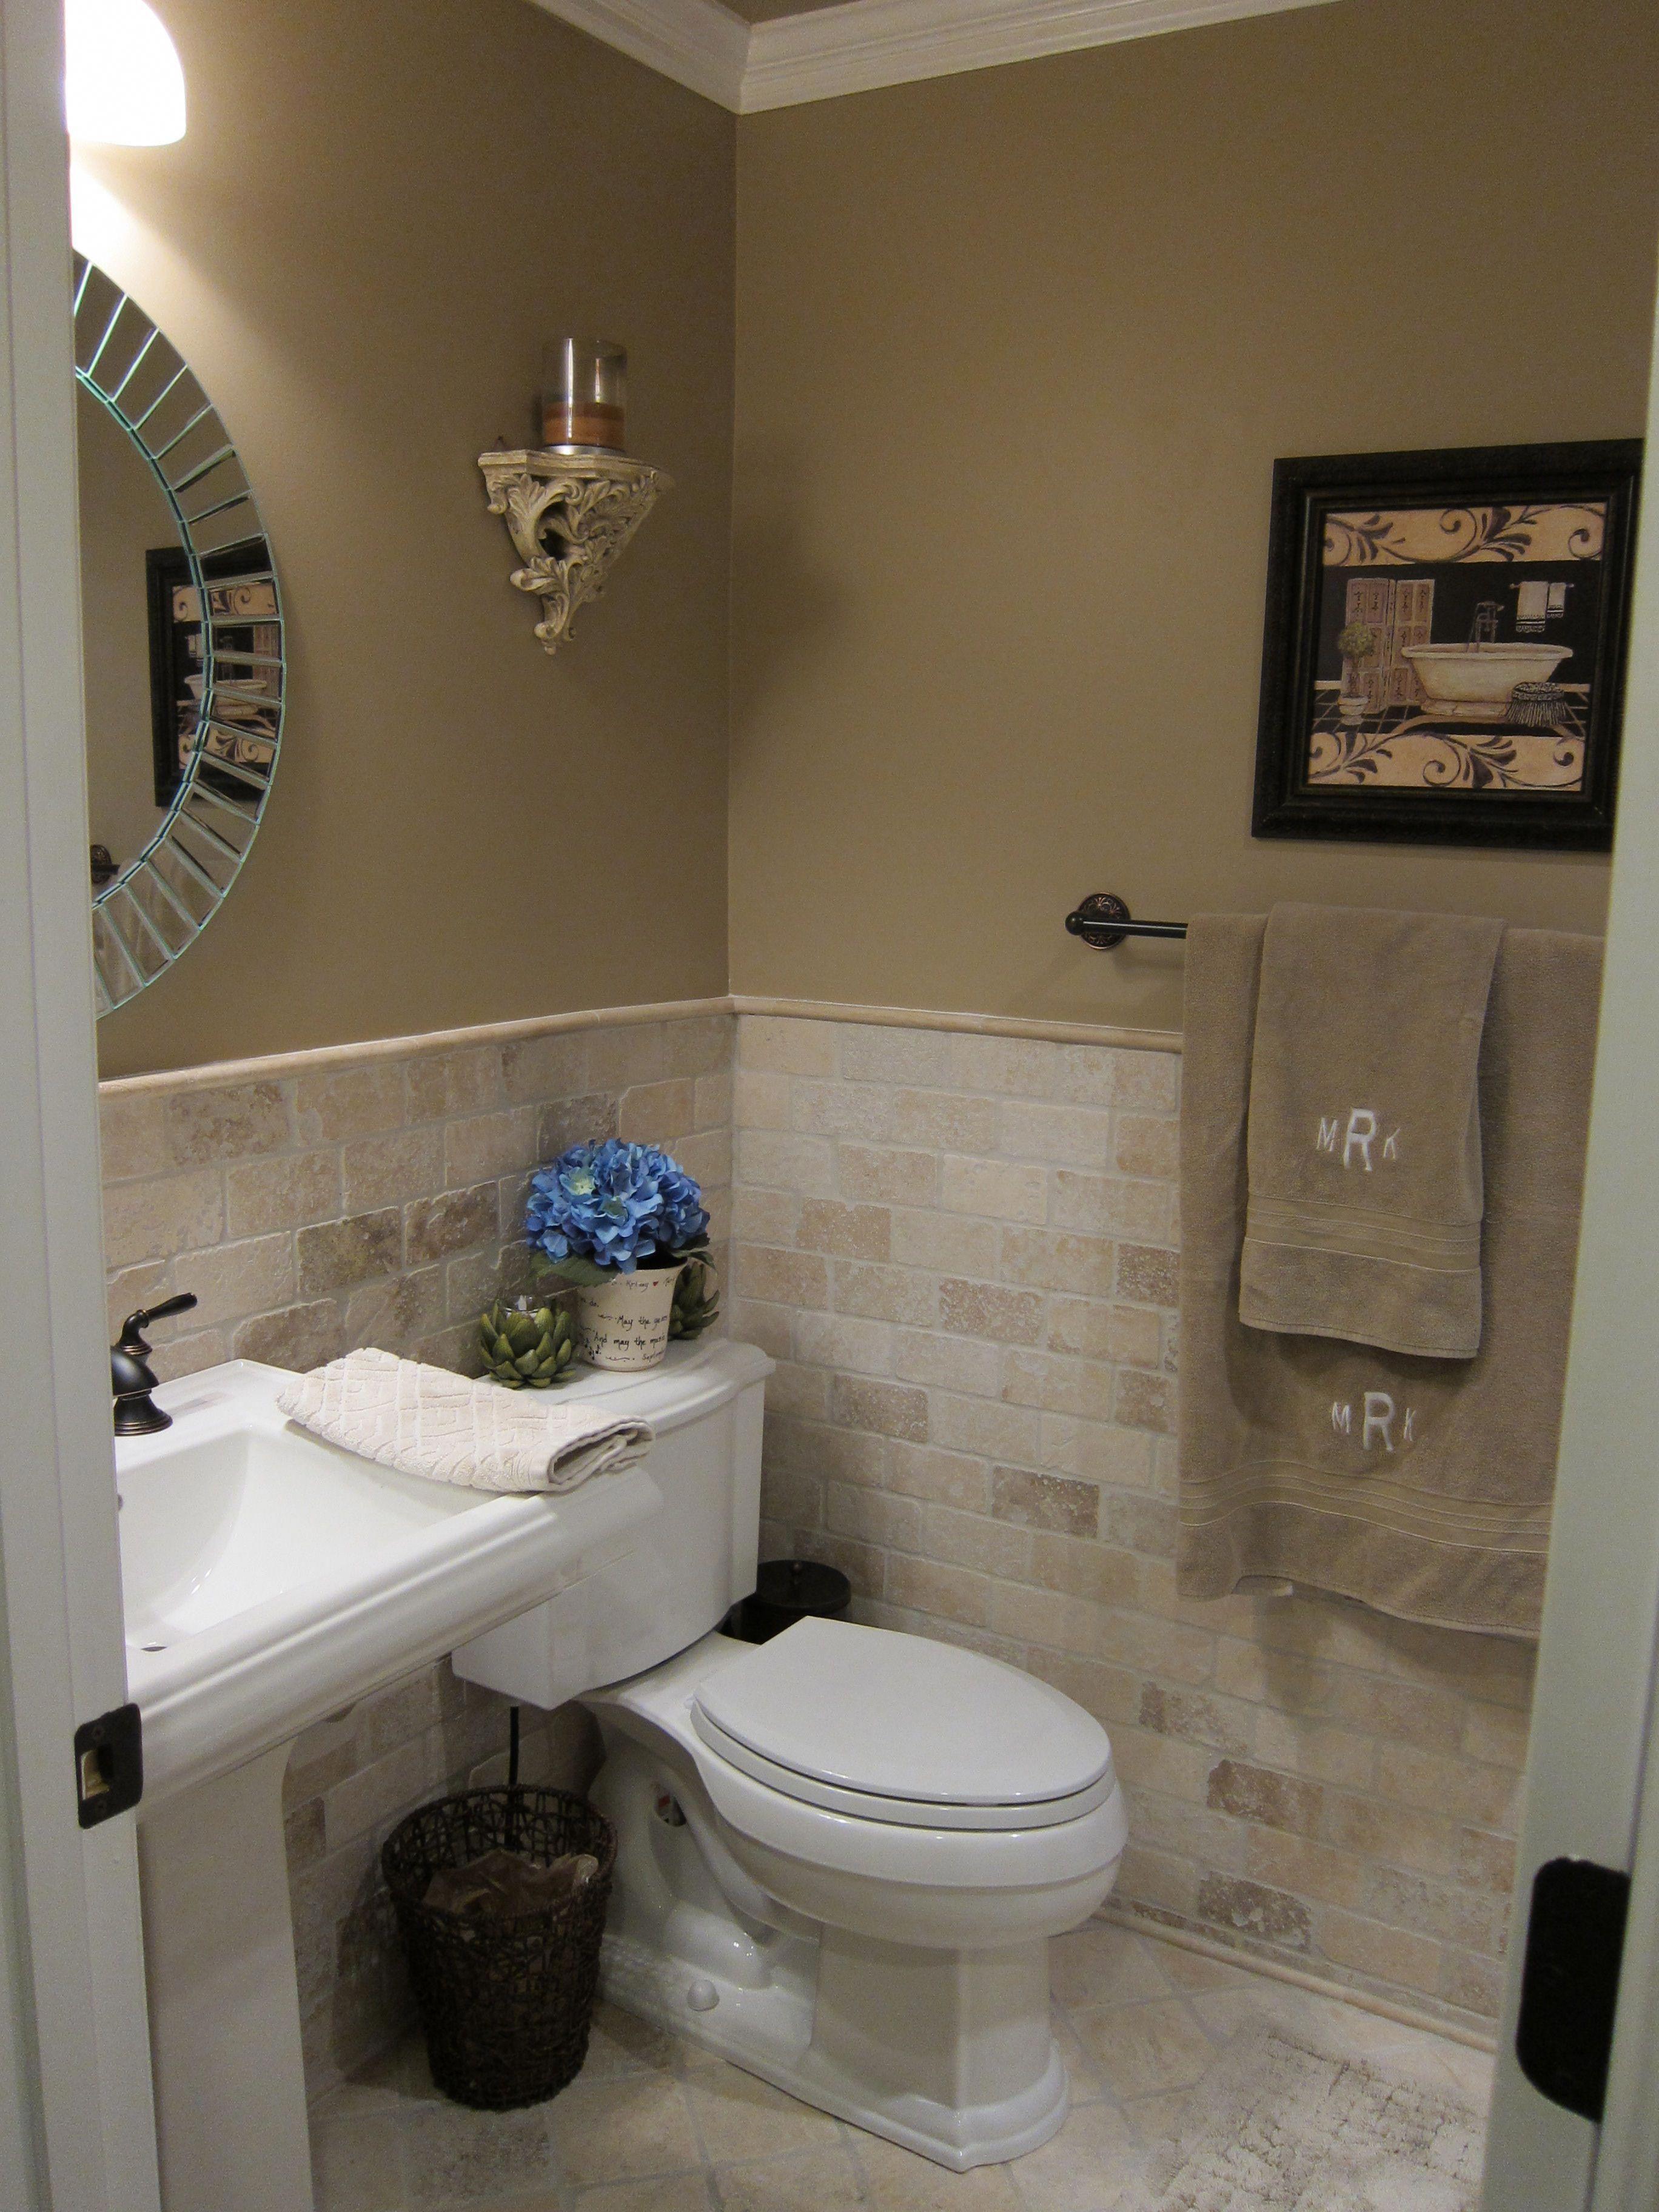 13 breathtaking small bathroom remodel on a budget ideas on bathroom renovation ideas id=76780